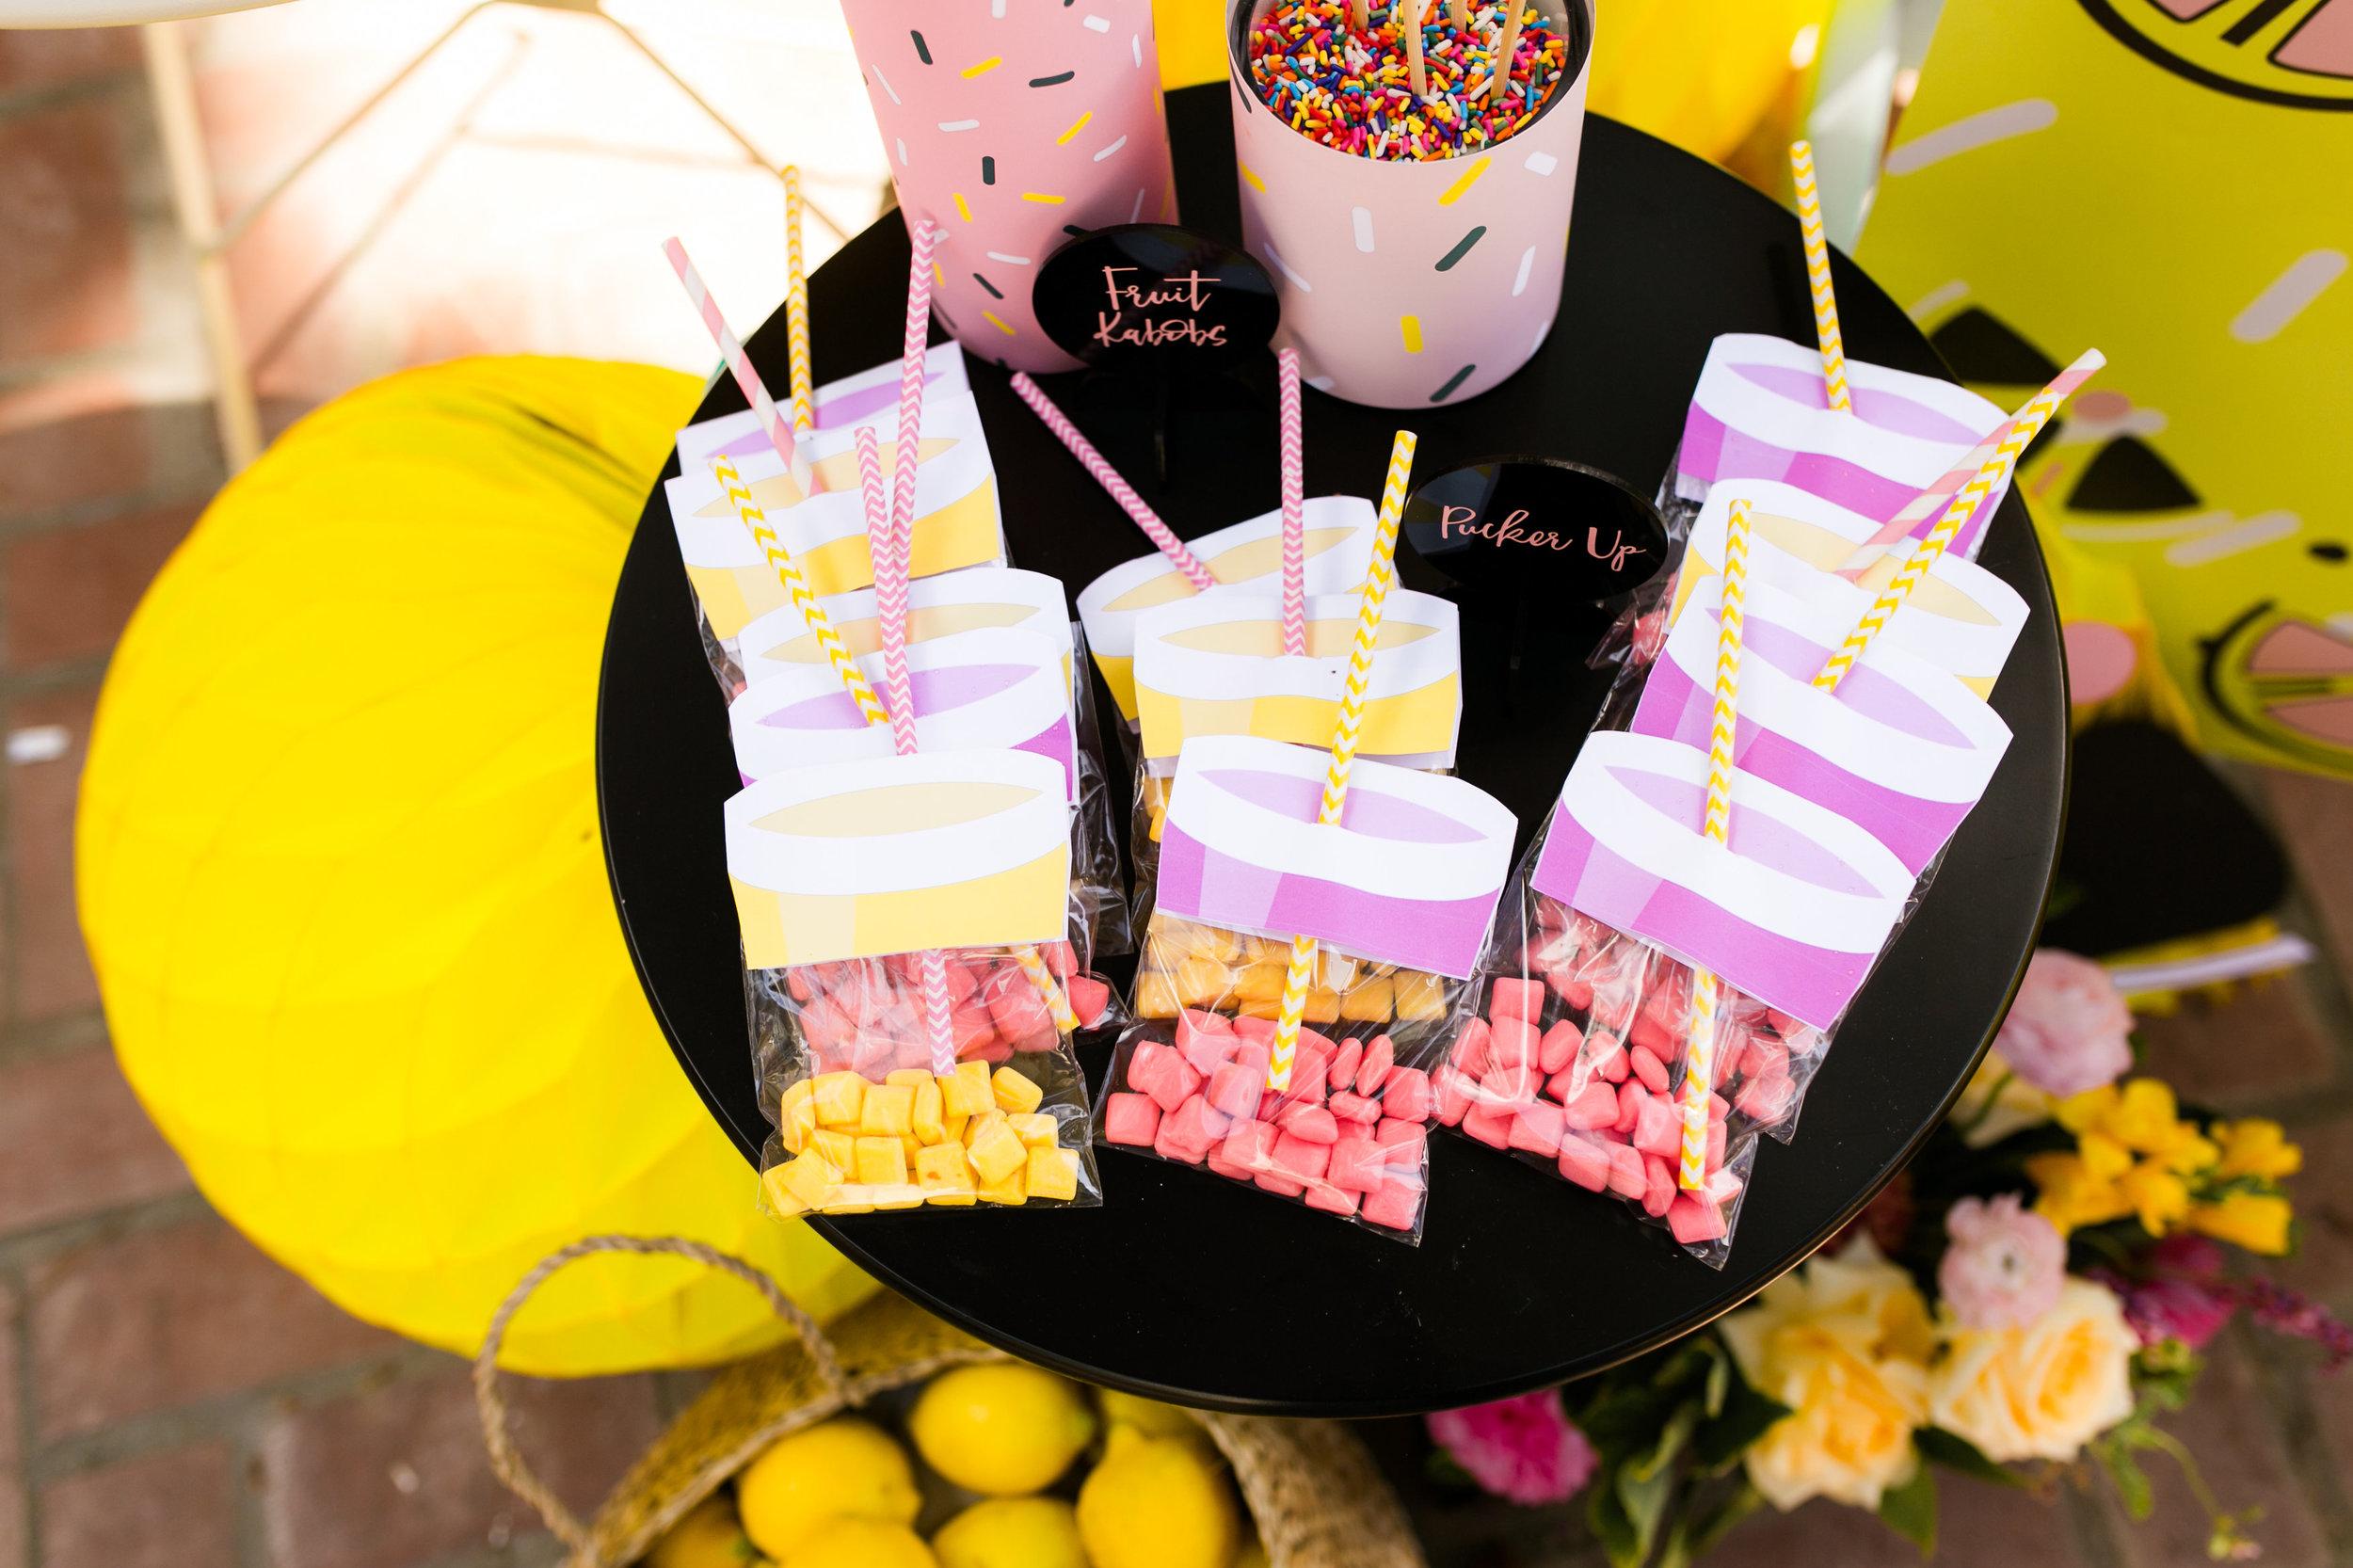 Lemonade Kids Party Favors - Lemonade Candy bags